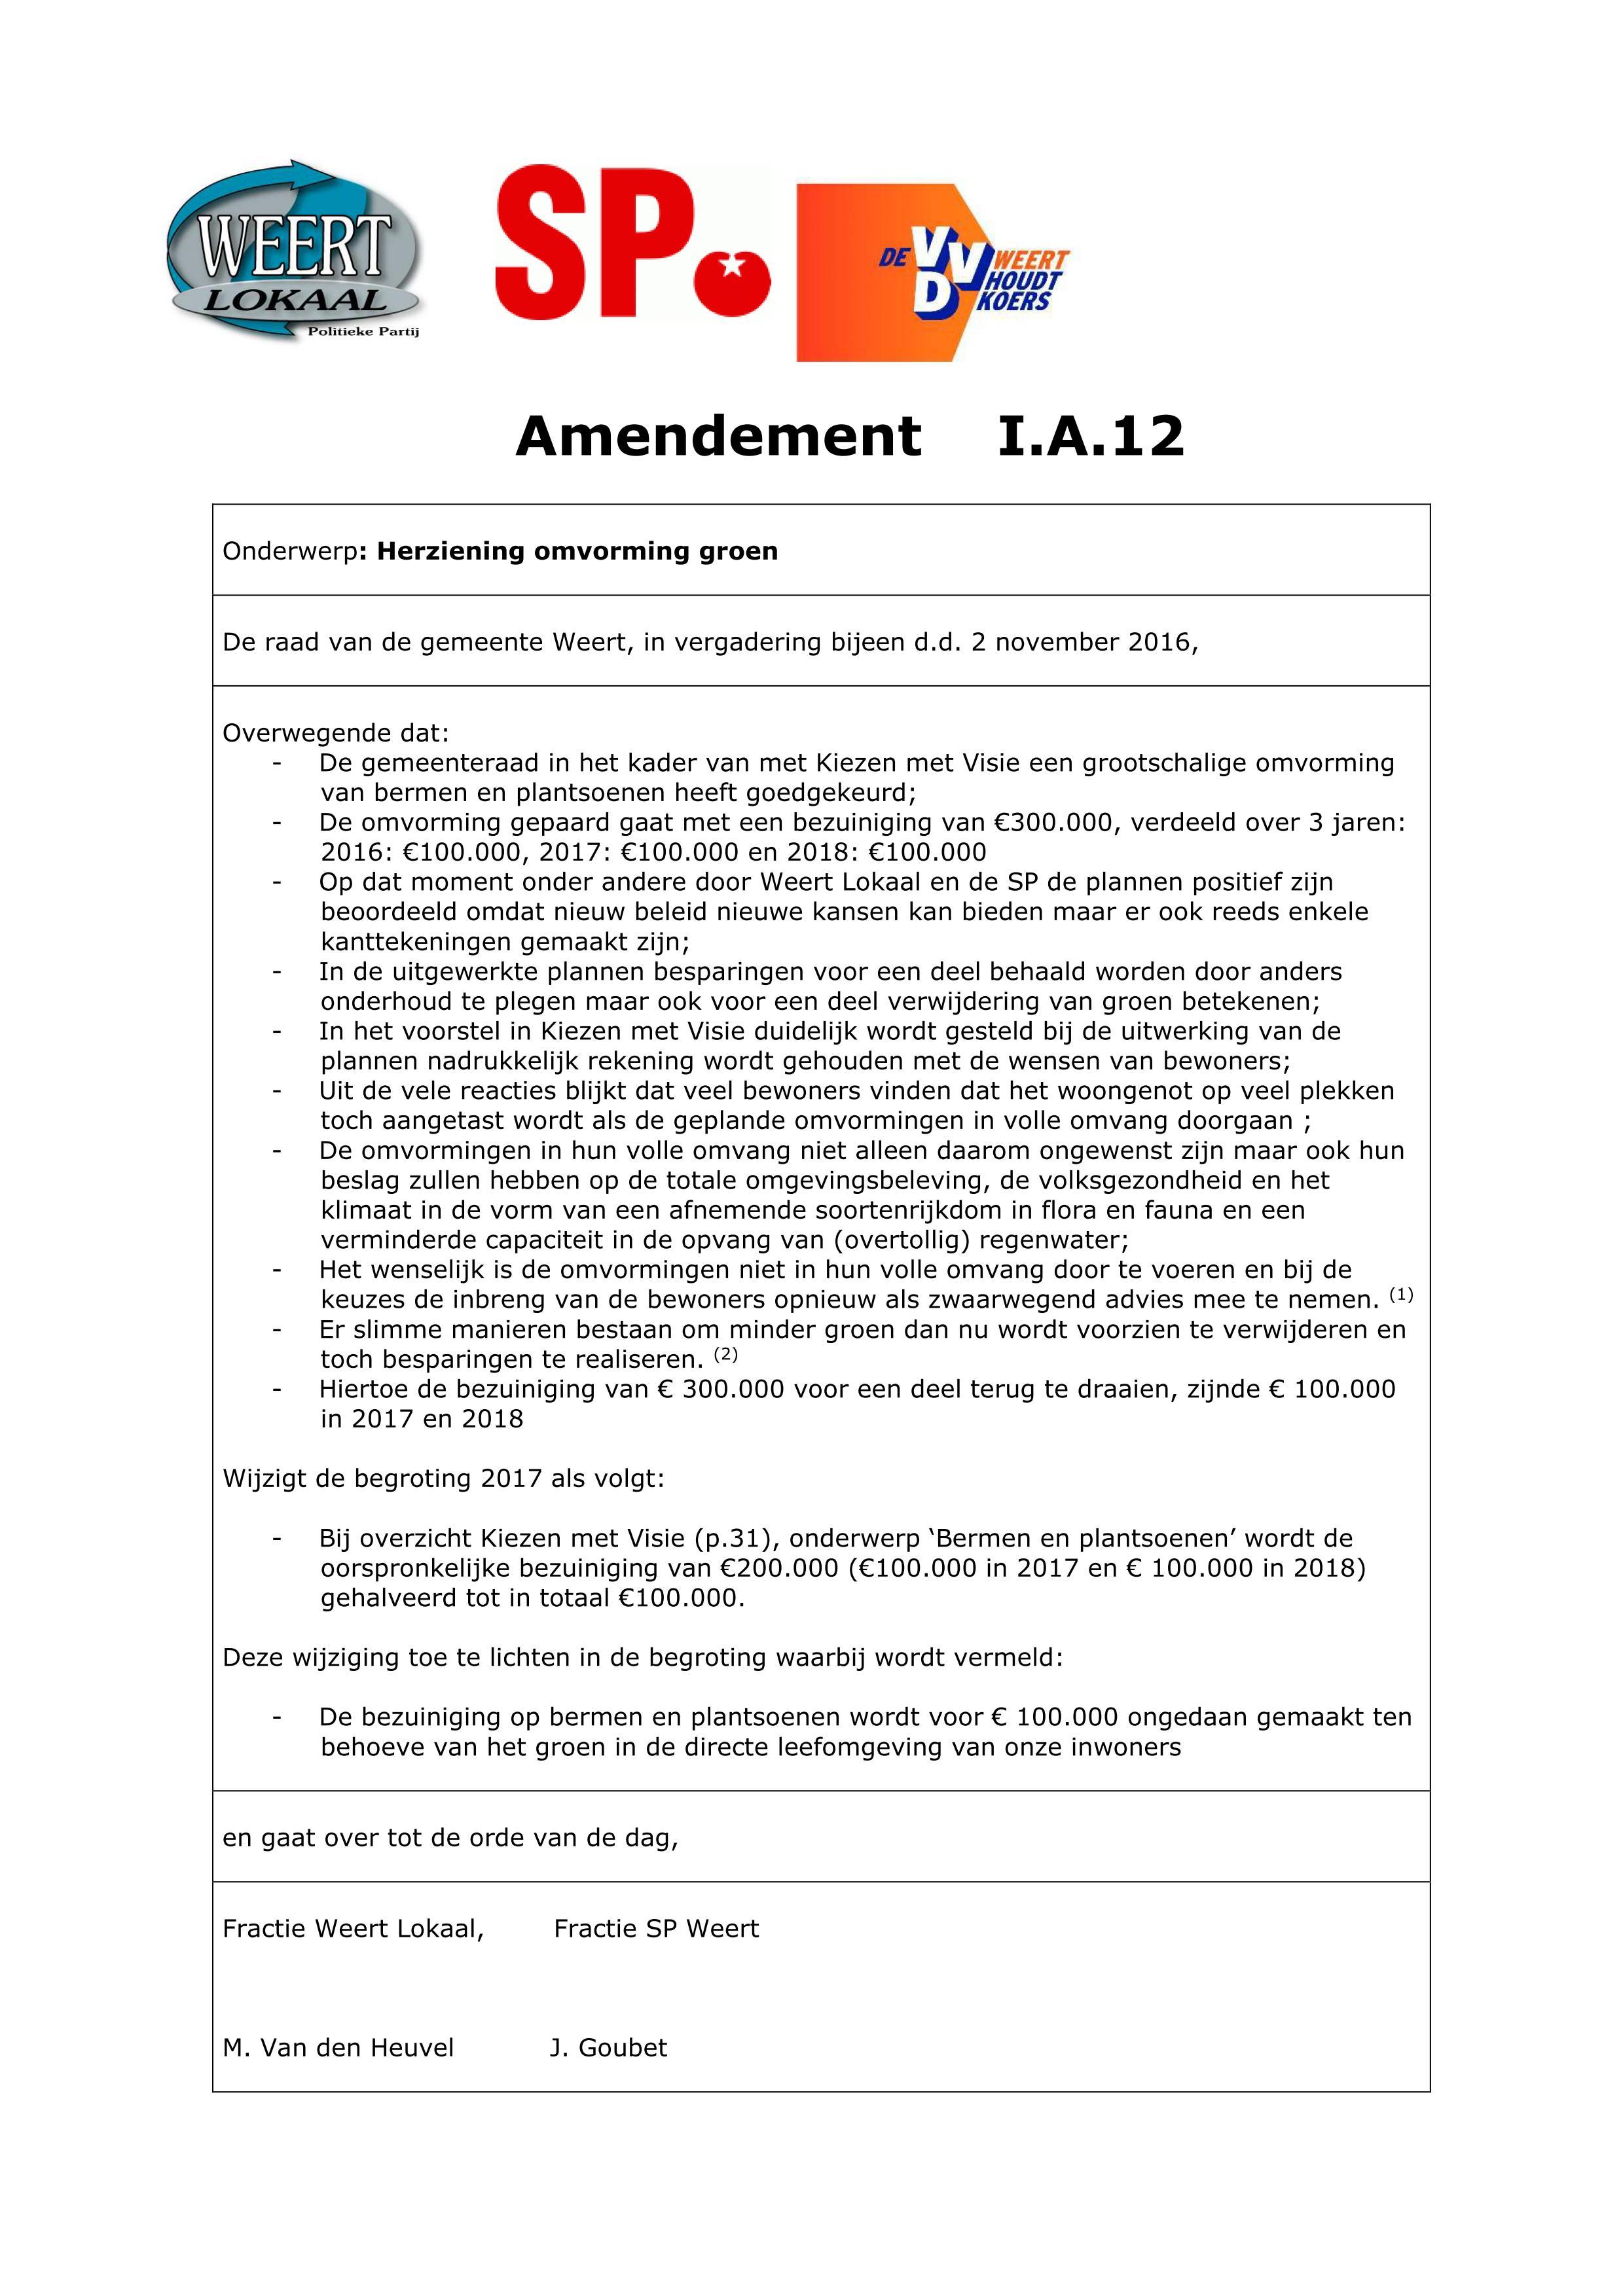 i-a-12-amendement-wl-en-sp-herziening-omvorming-groen-in-directe-leefomgeving-jg_gedeeld